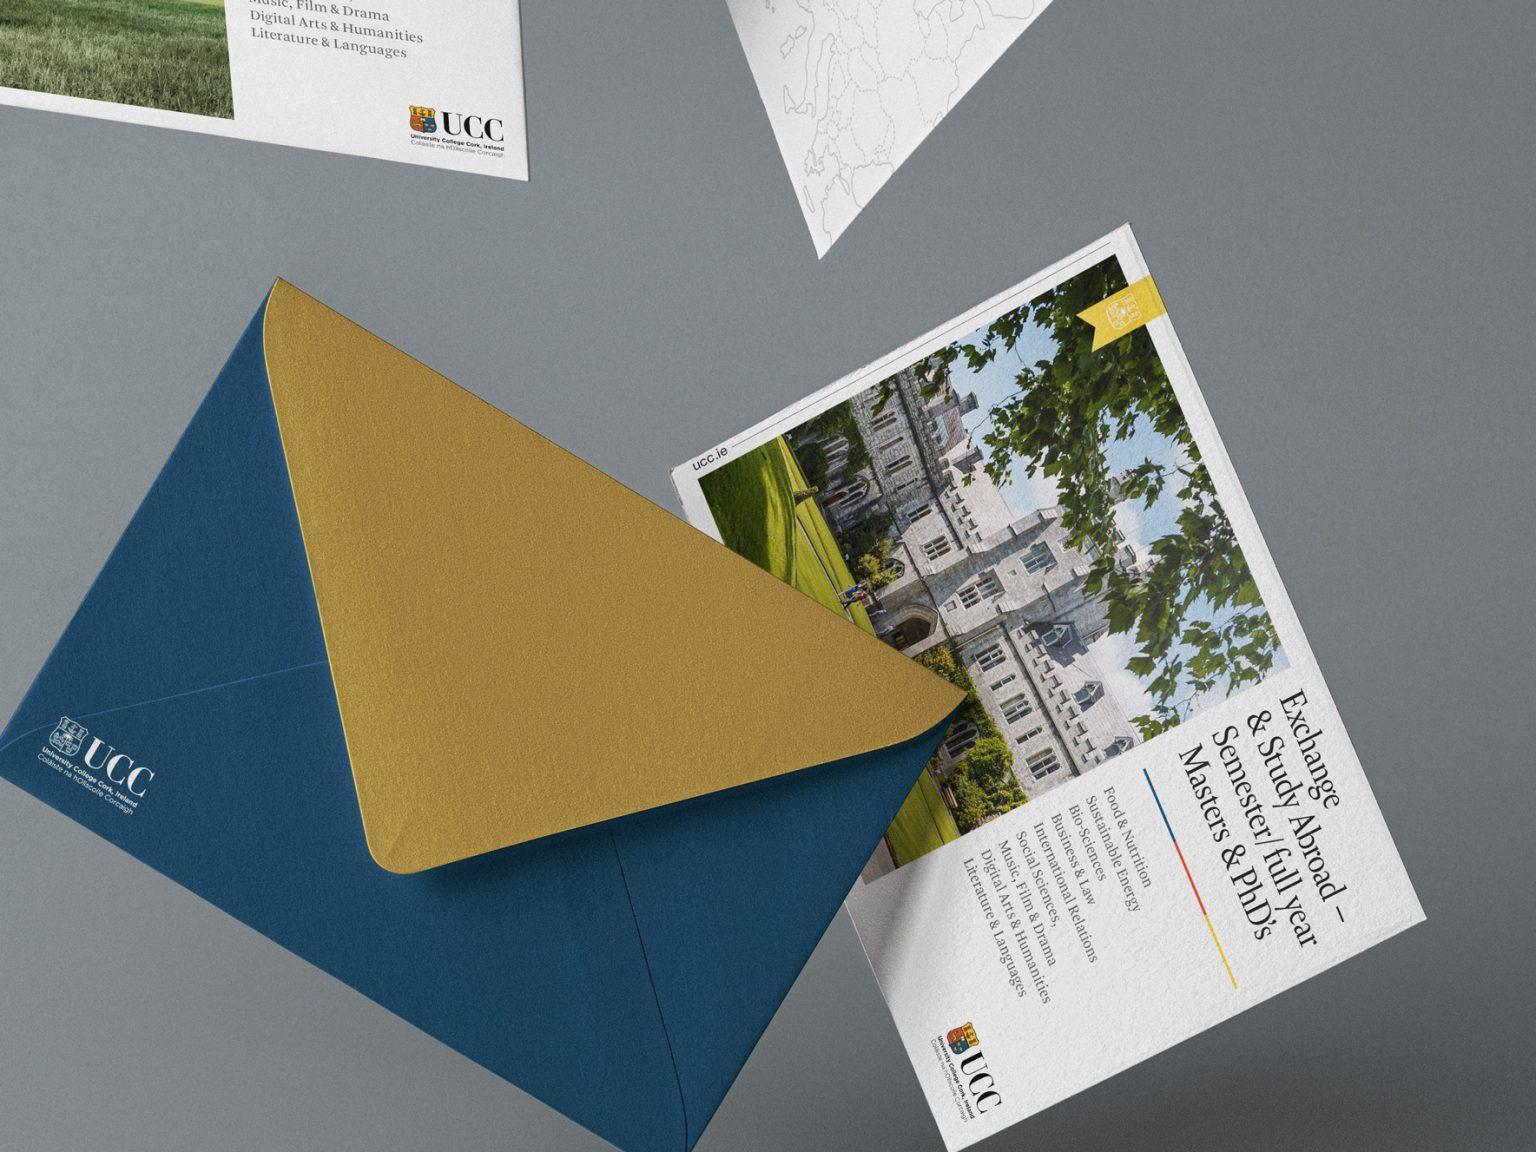 Falling-brochures-Landscape-4x3